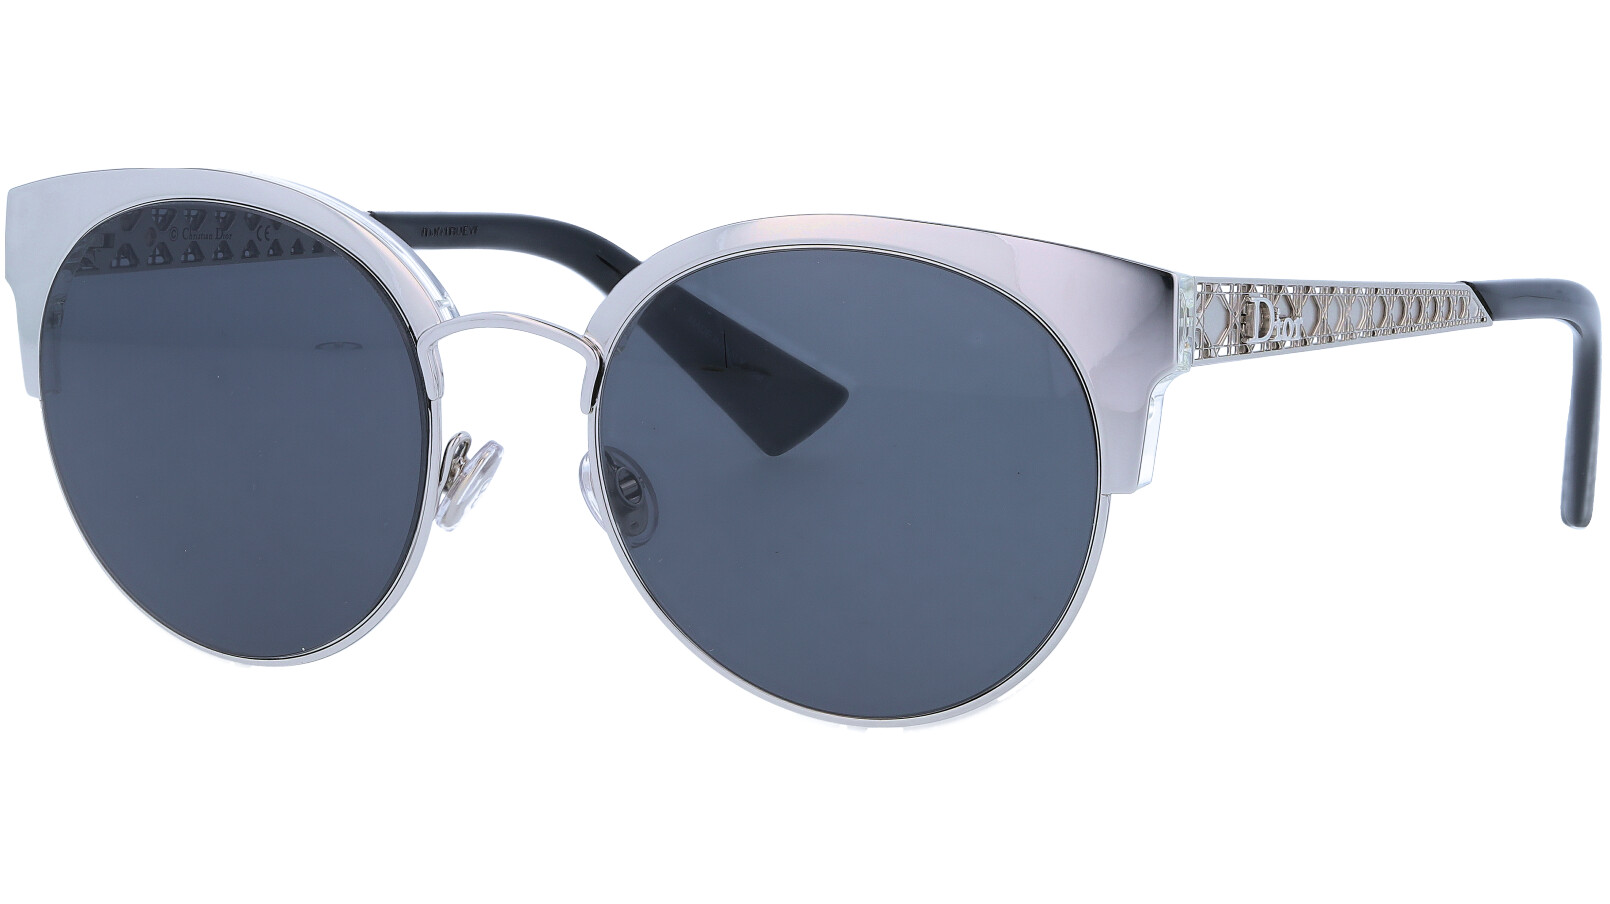 DIOR DIORAMAMINI S8R0J 50 LIGHT Sunglasses